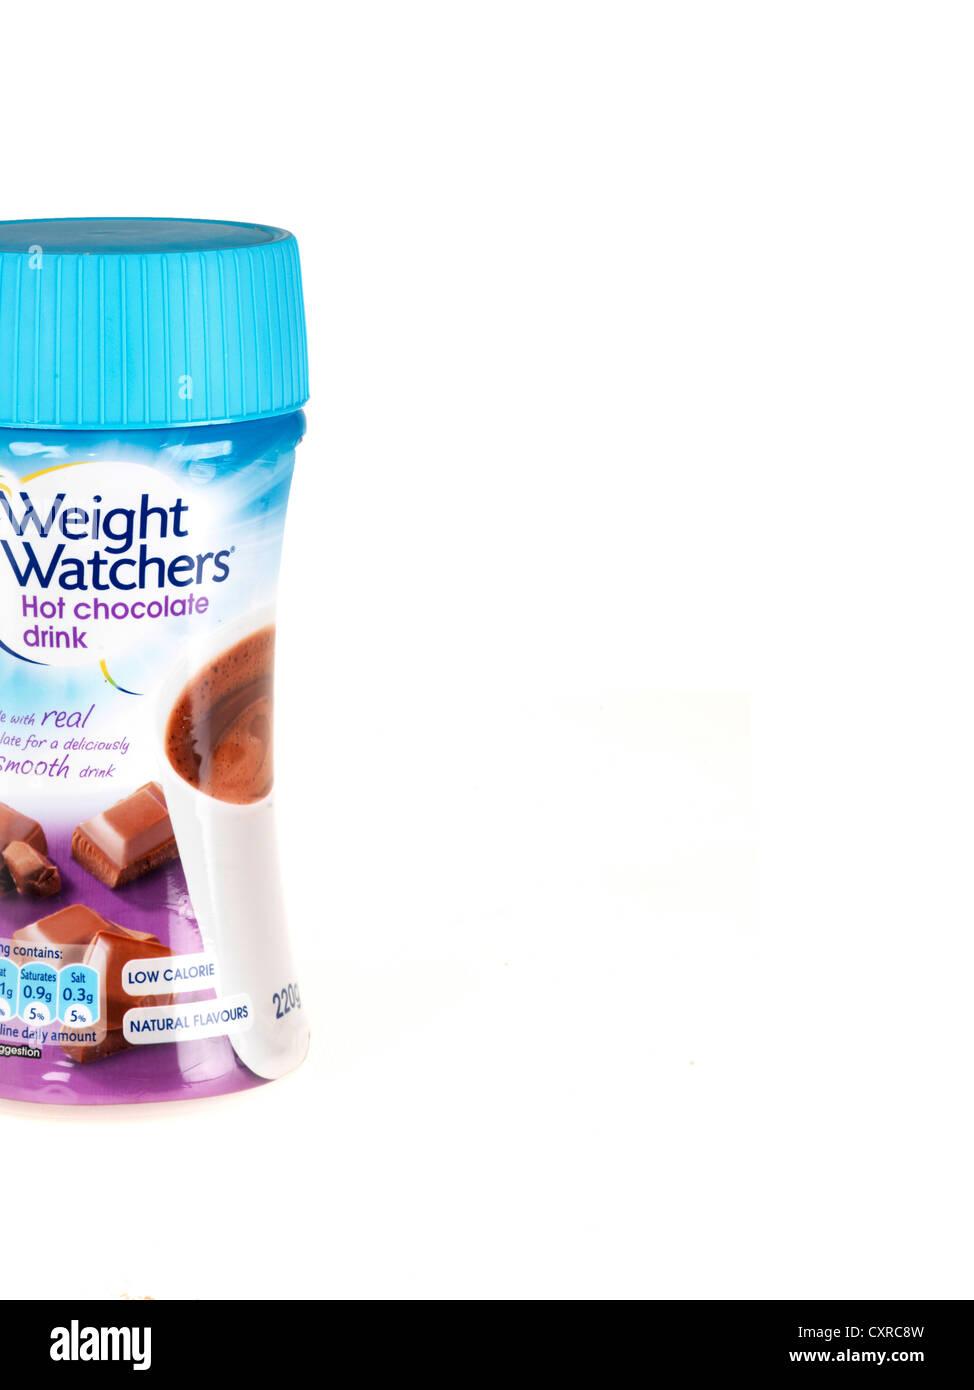 Weight Watchers Hot Chocolate - Stock Image